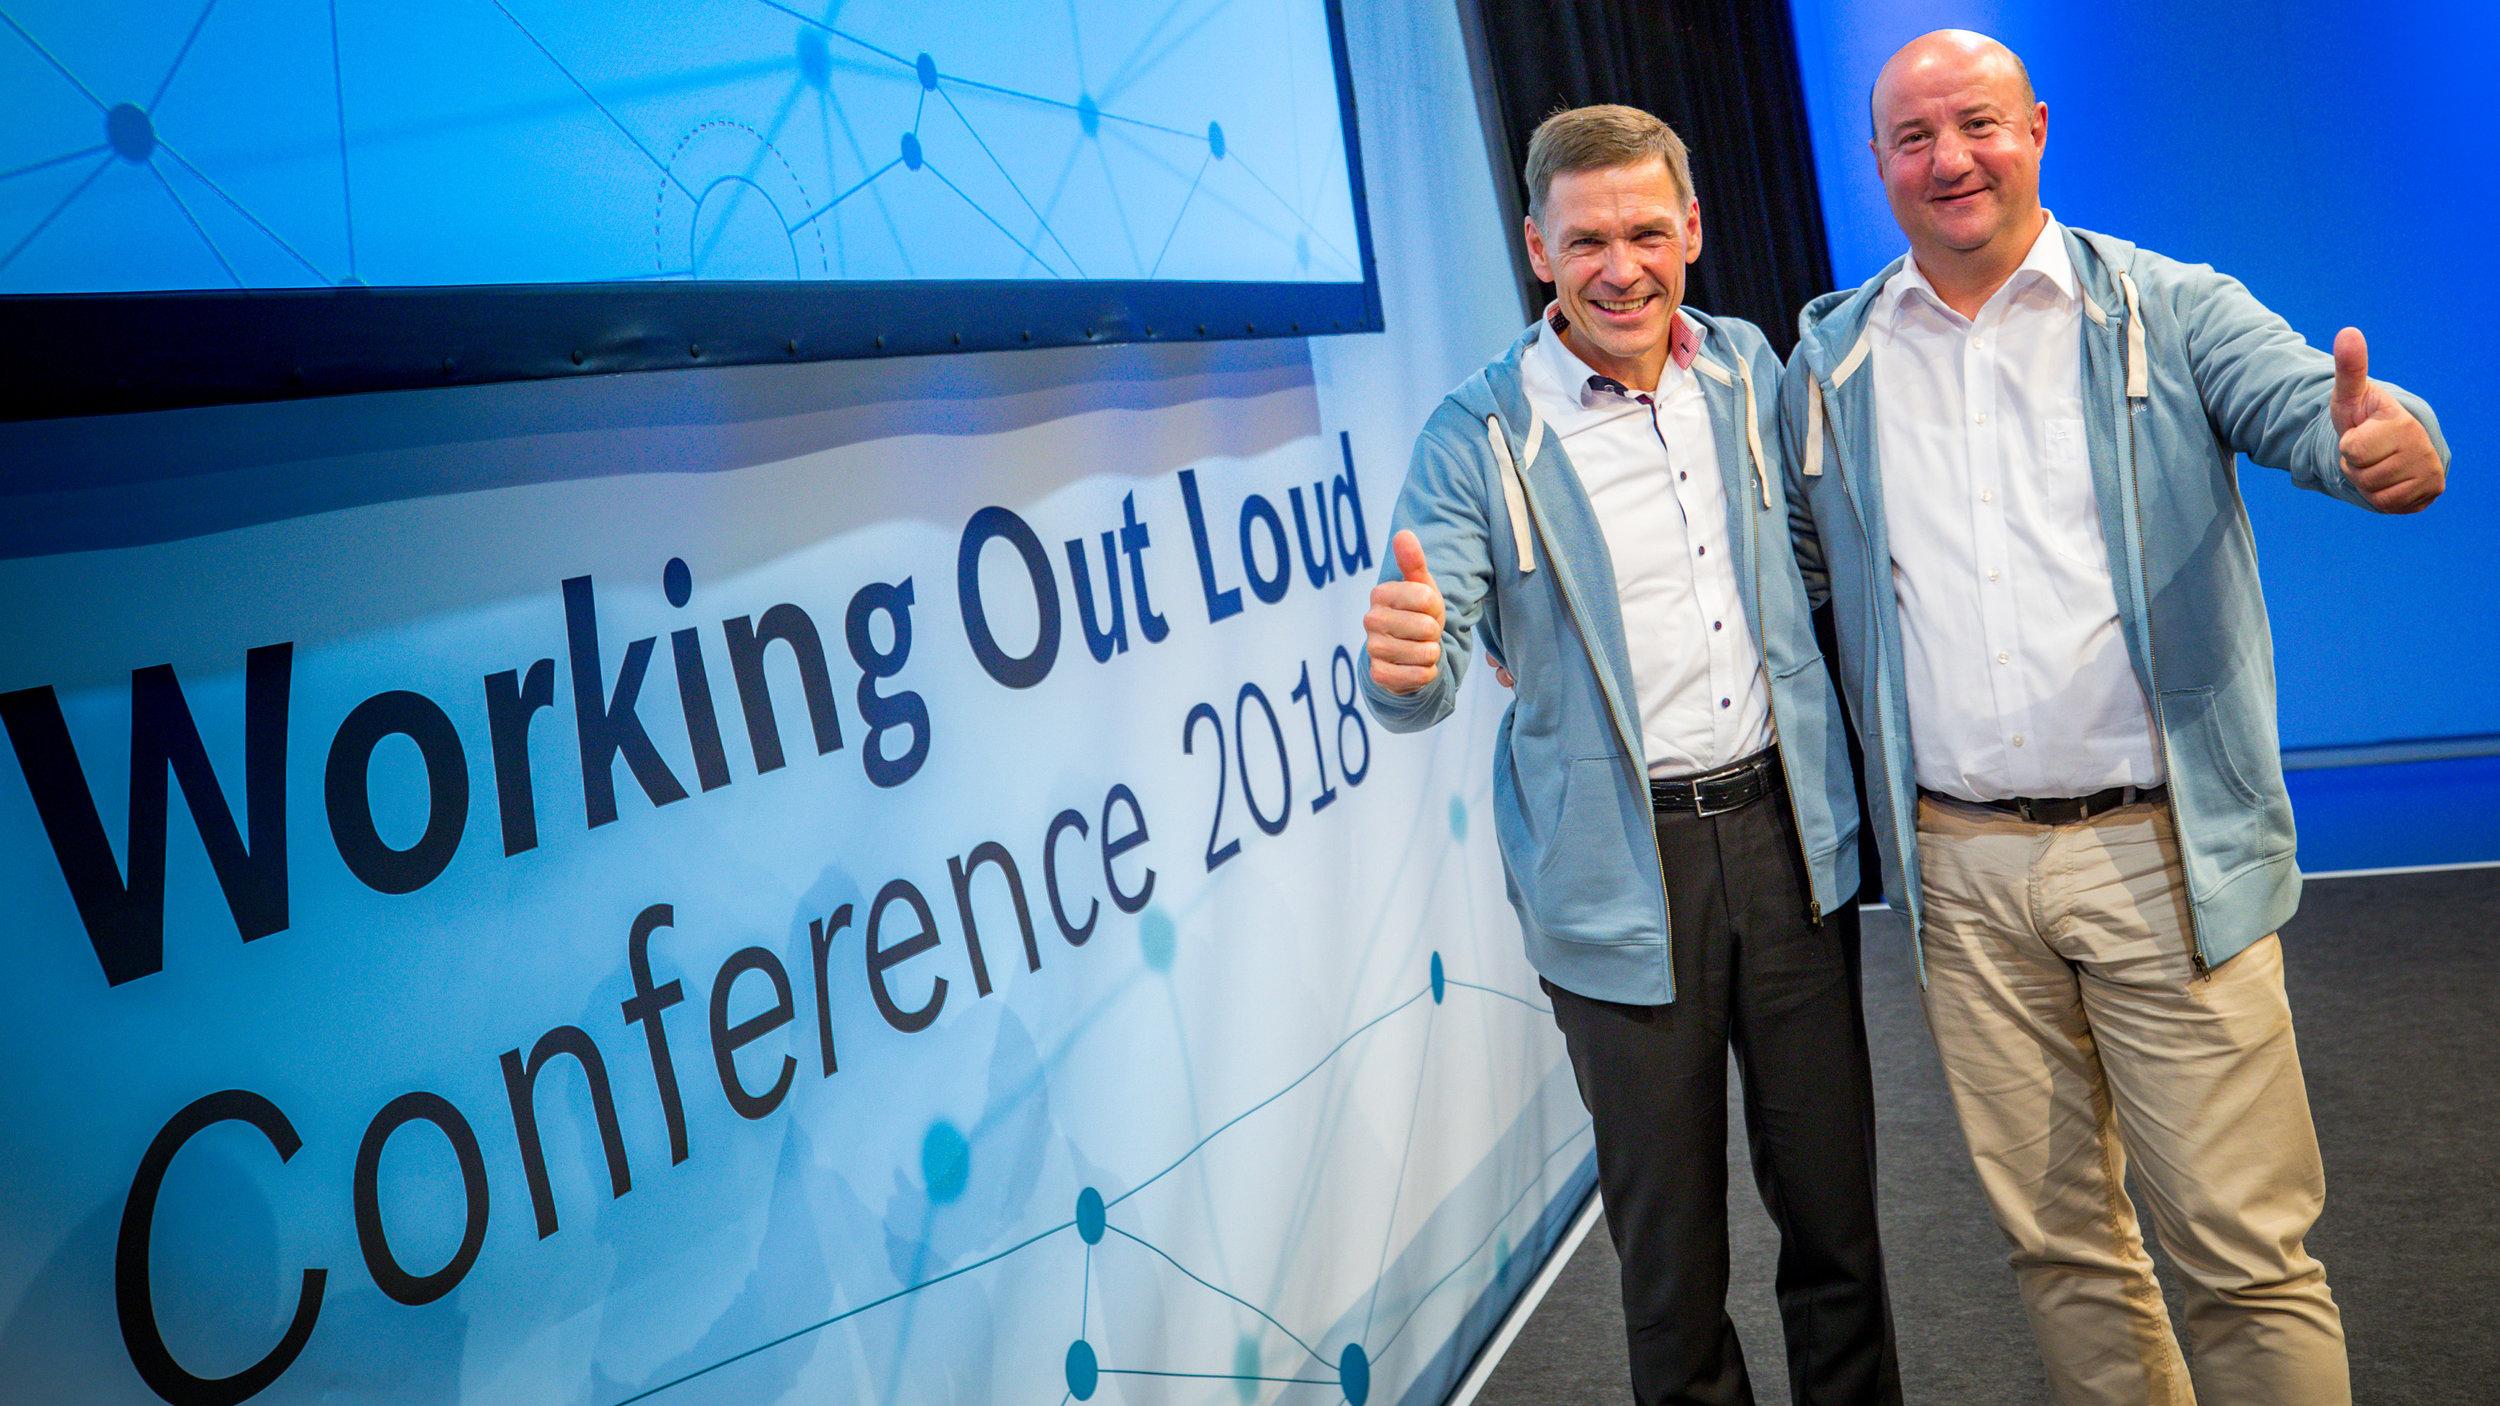 Christoph KÜbel & Michael Brecht, Board MemberS From Bosch & Daimler